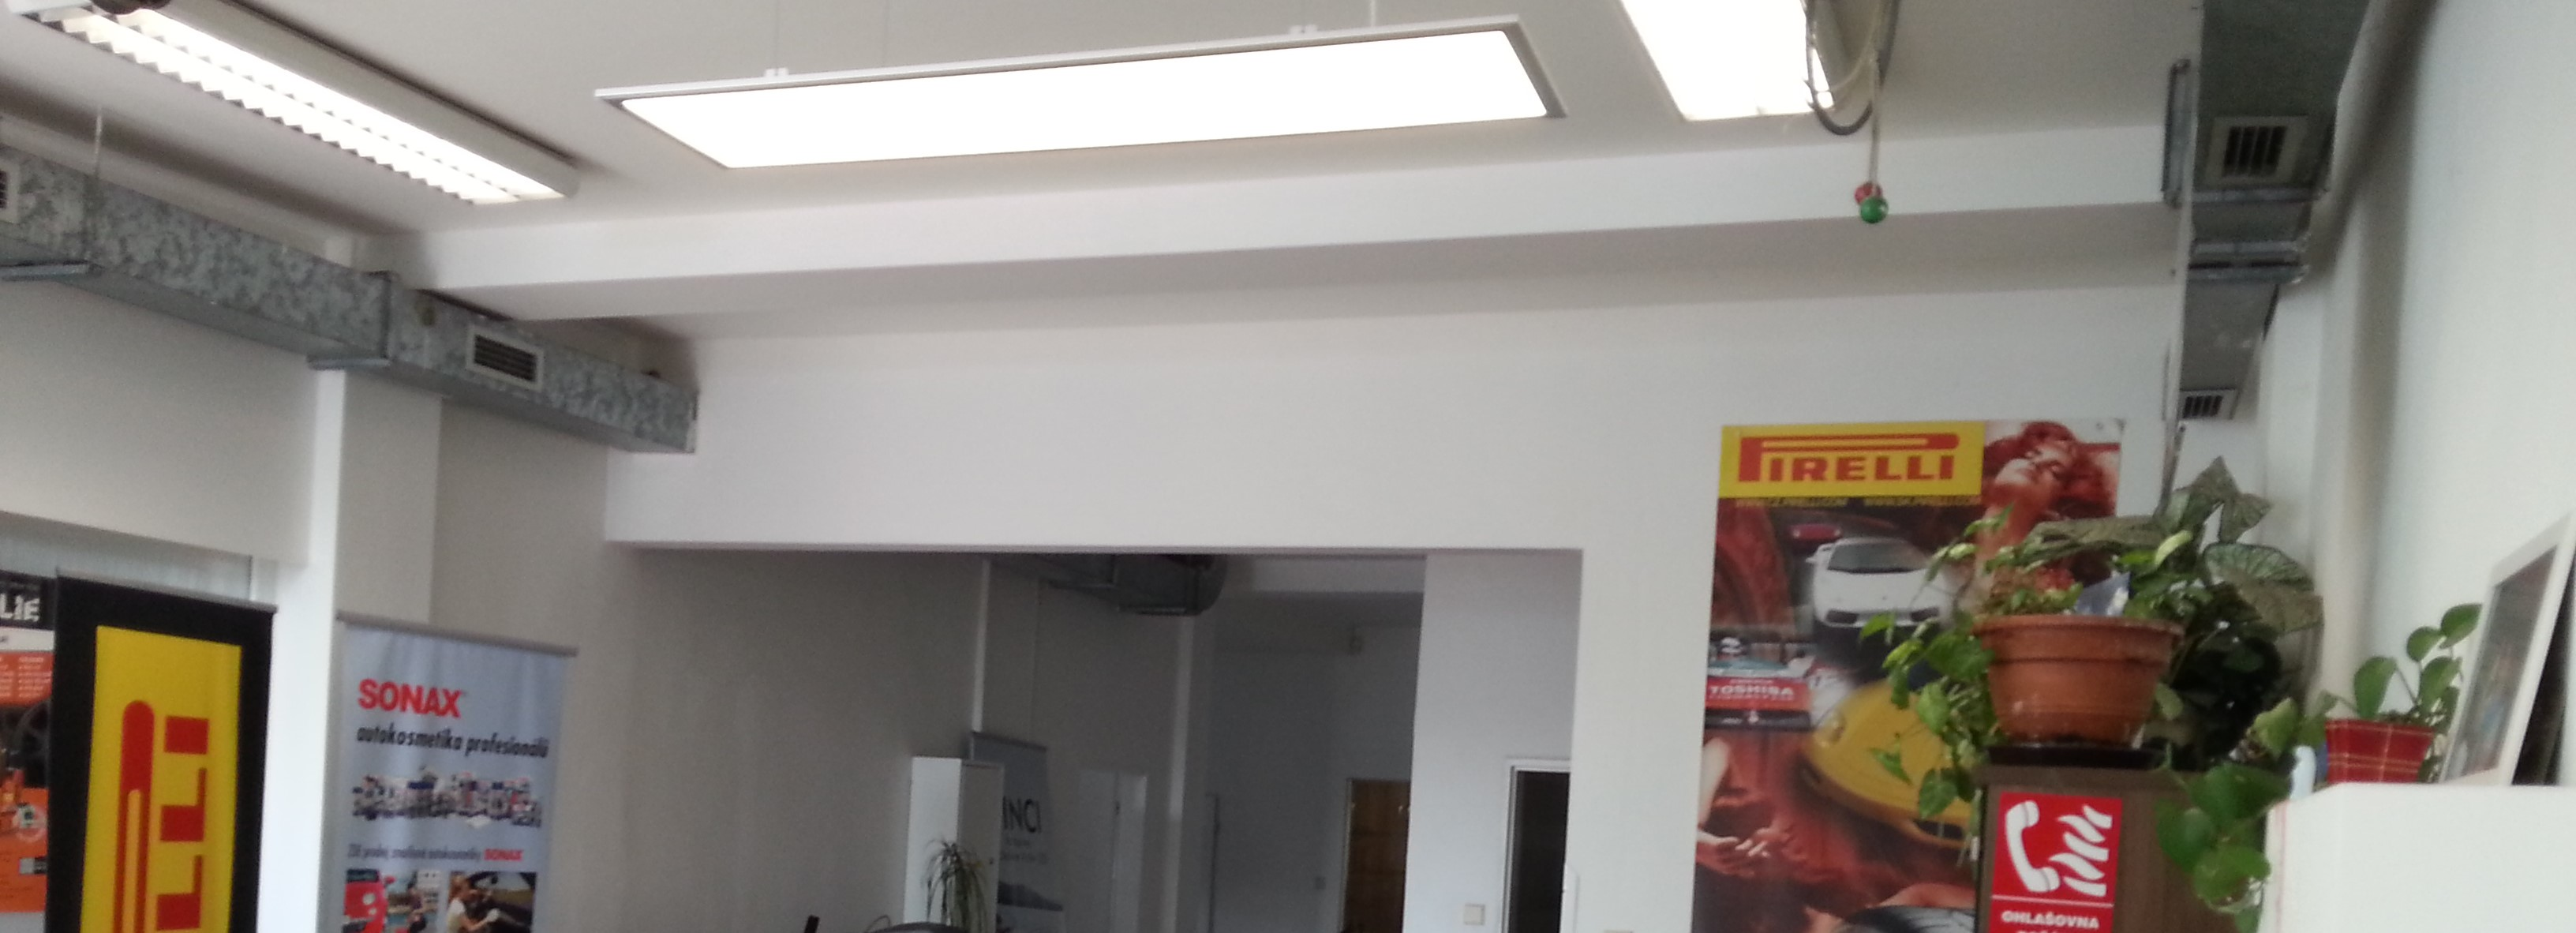 instalace_led_svetel_autoservis_osvetleni_praha_toplux